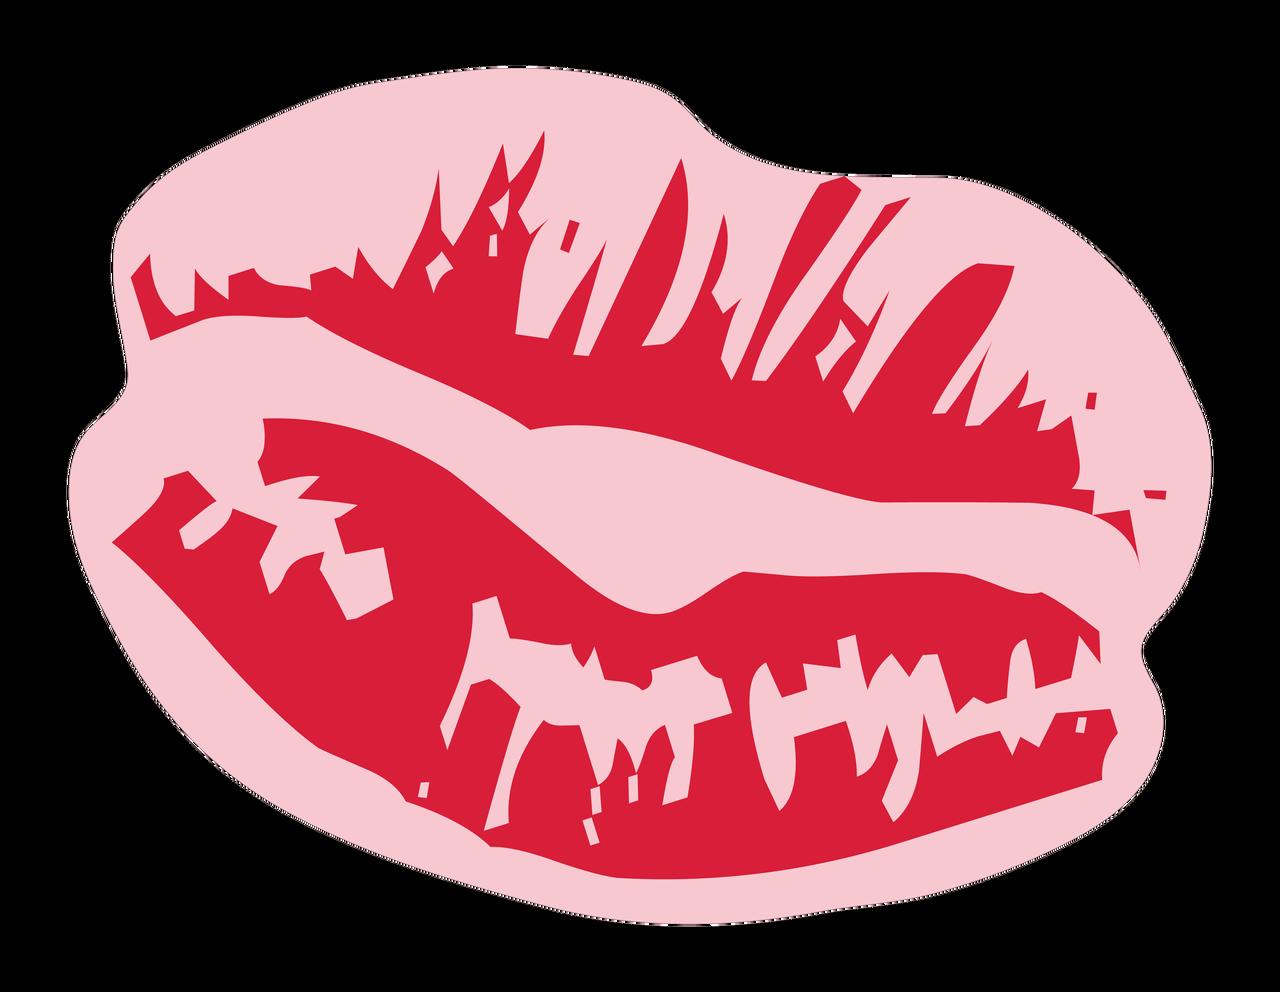 Kiss Print & Cut File